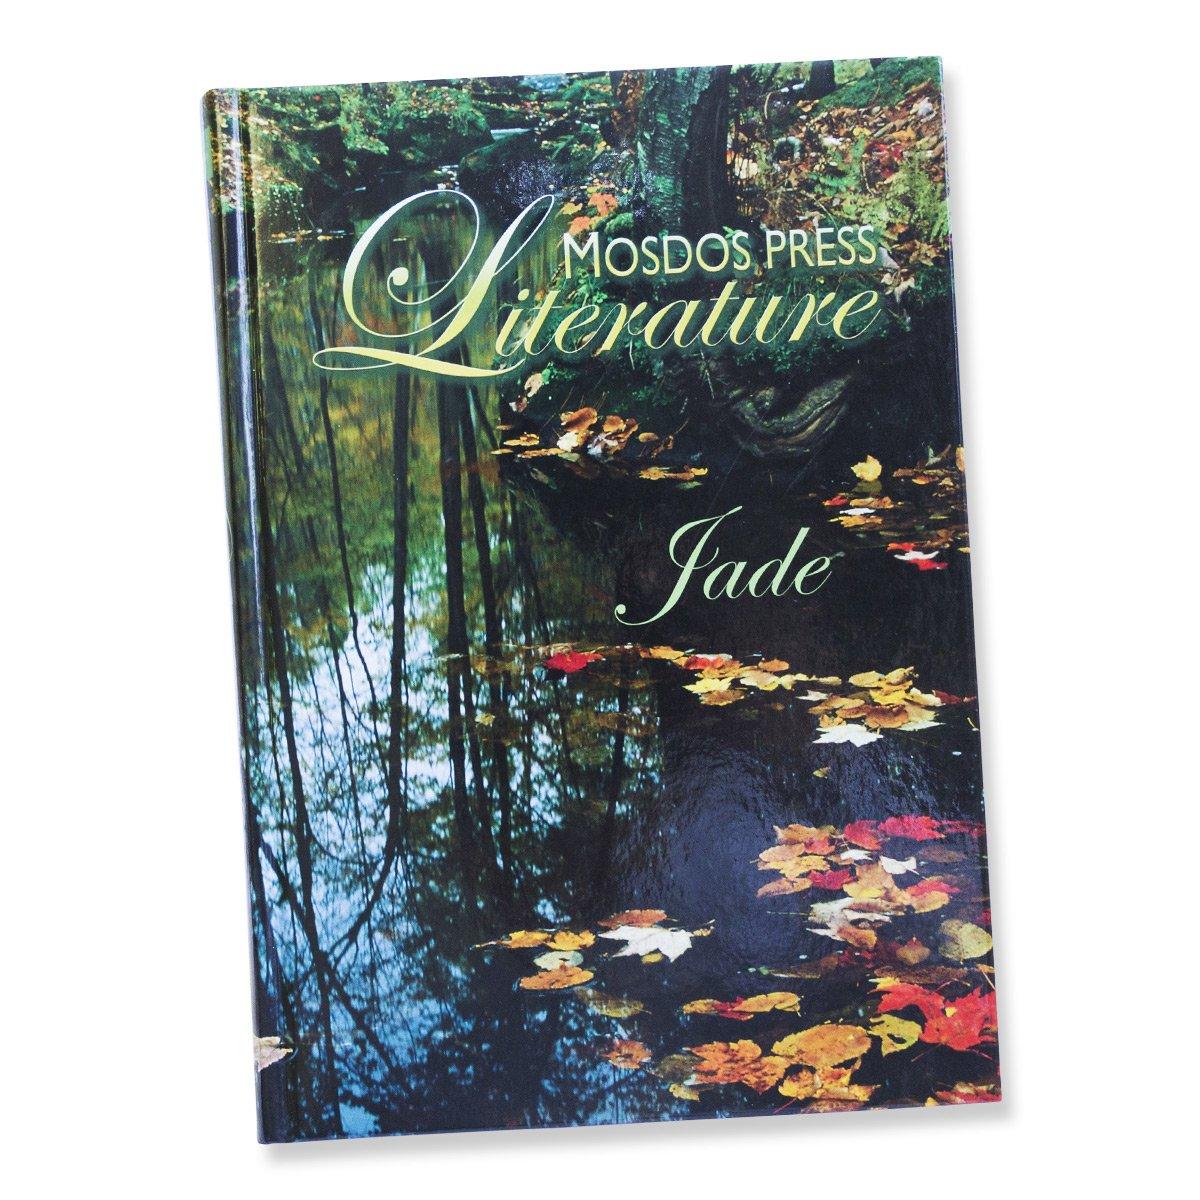 Image of 7th Grade- Mosdos Press Literature Series (Jade)